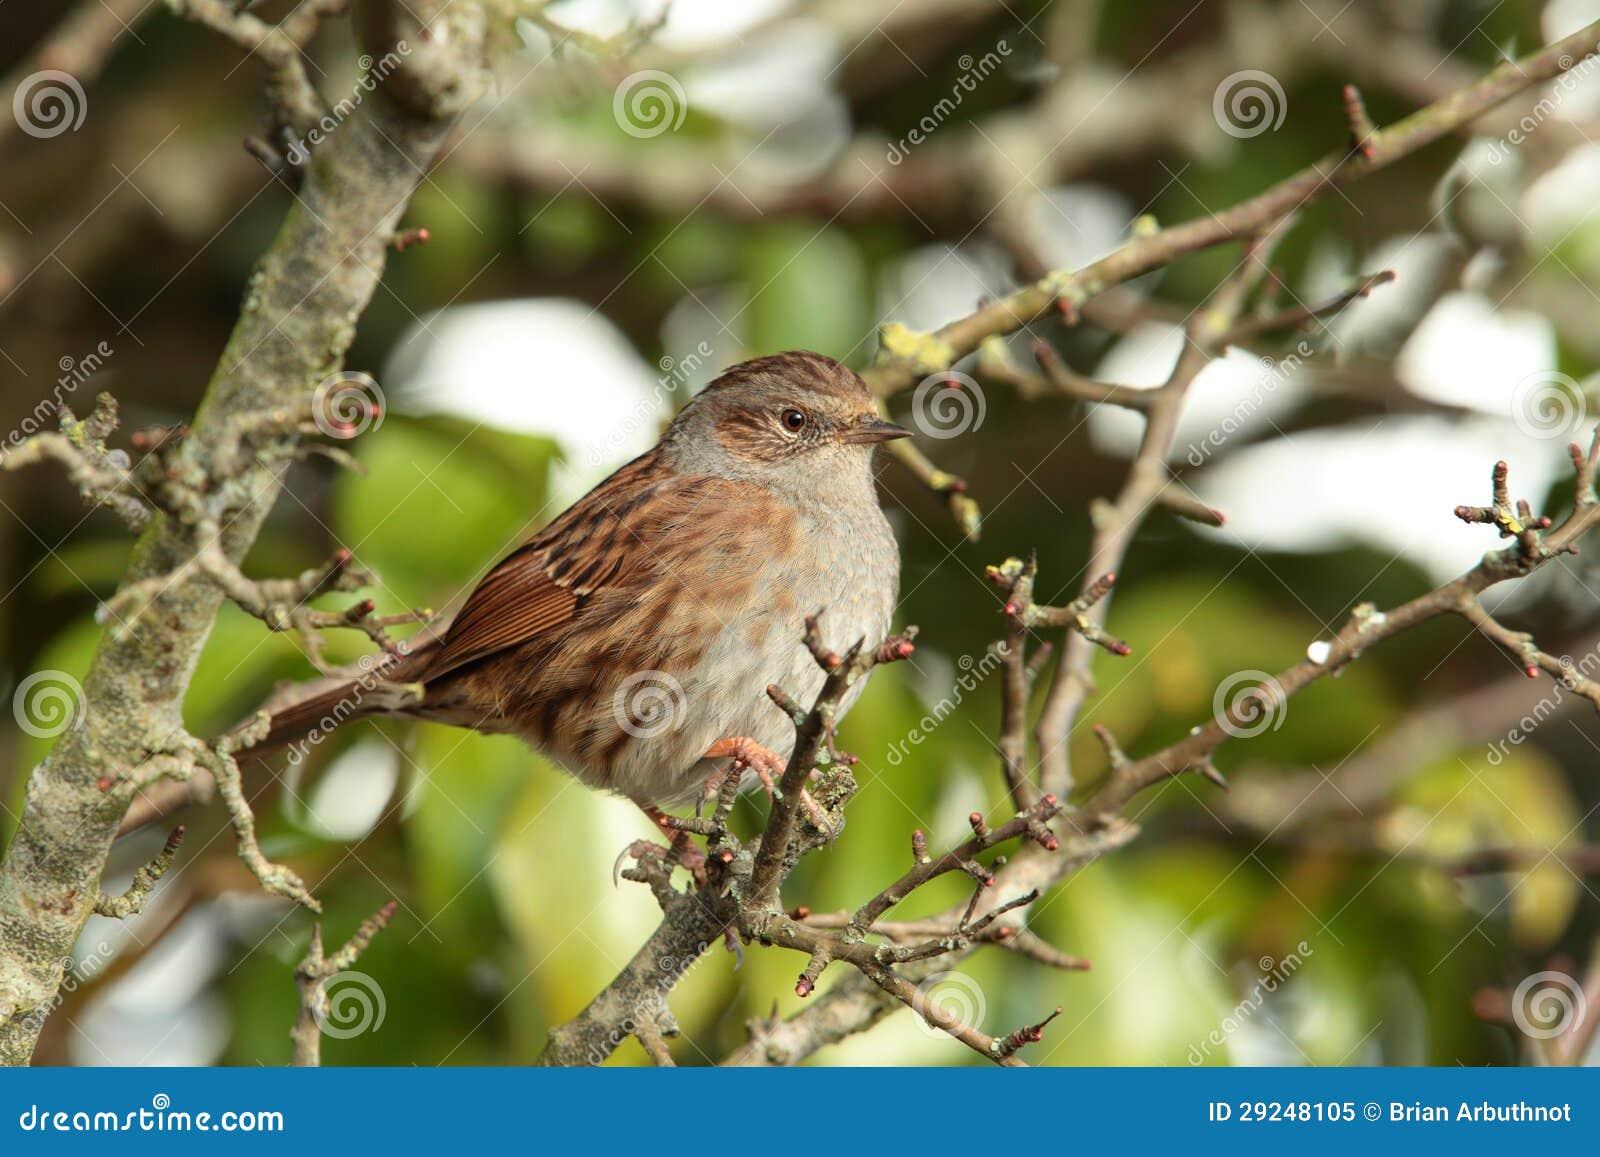 Download Dunnock. imagem de stock. Imagem de wildlife, pássaros - 29248105